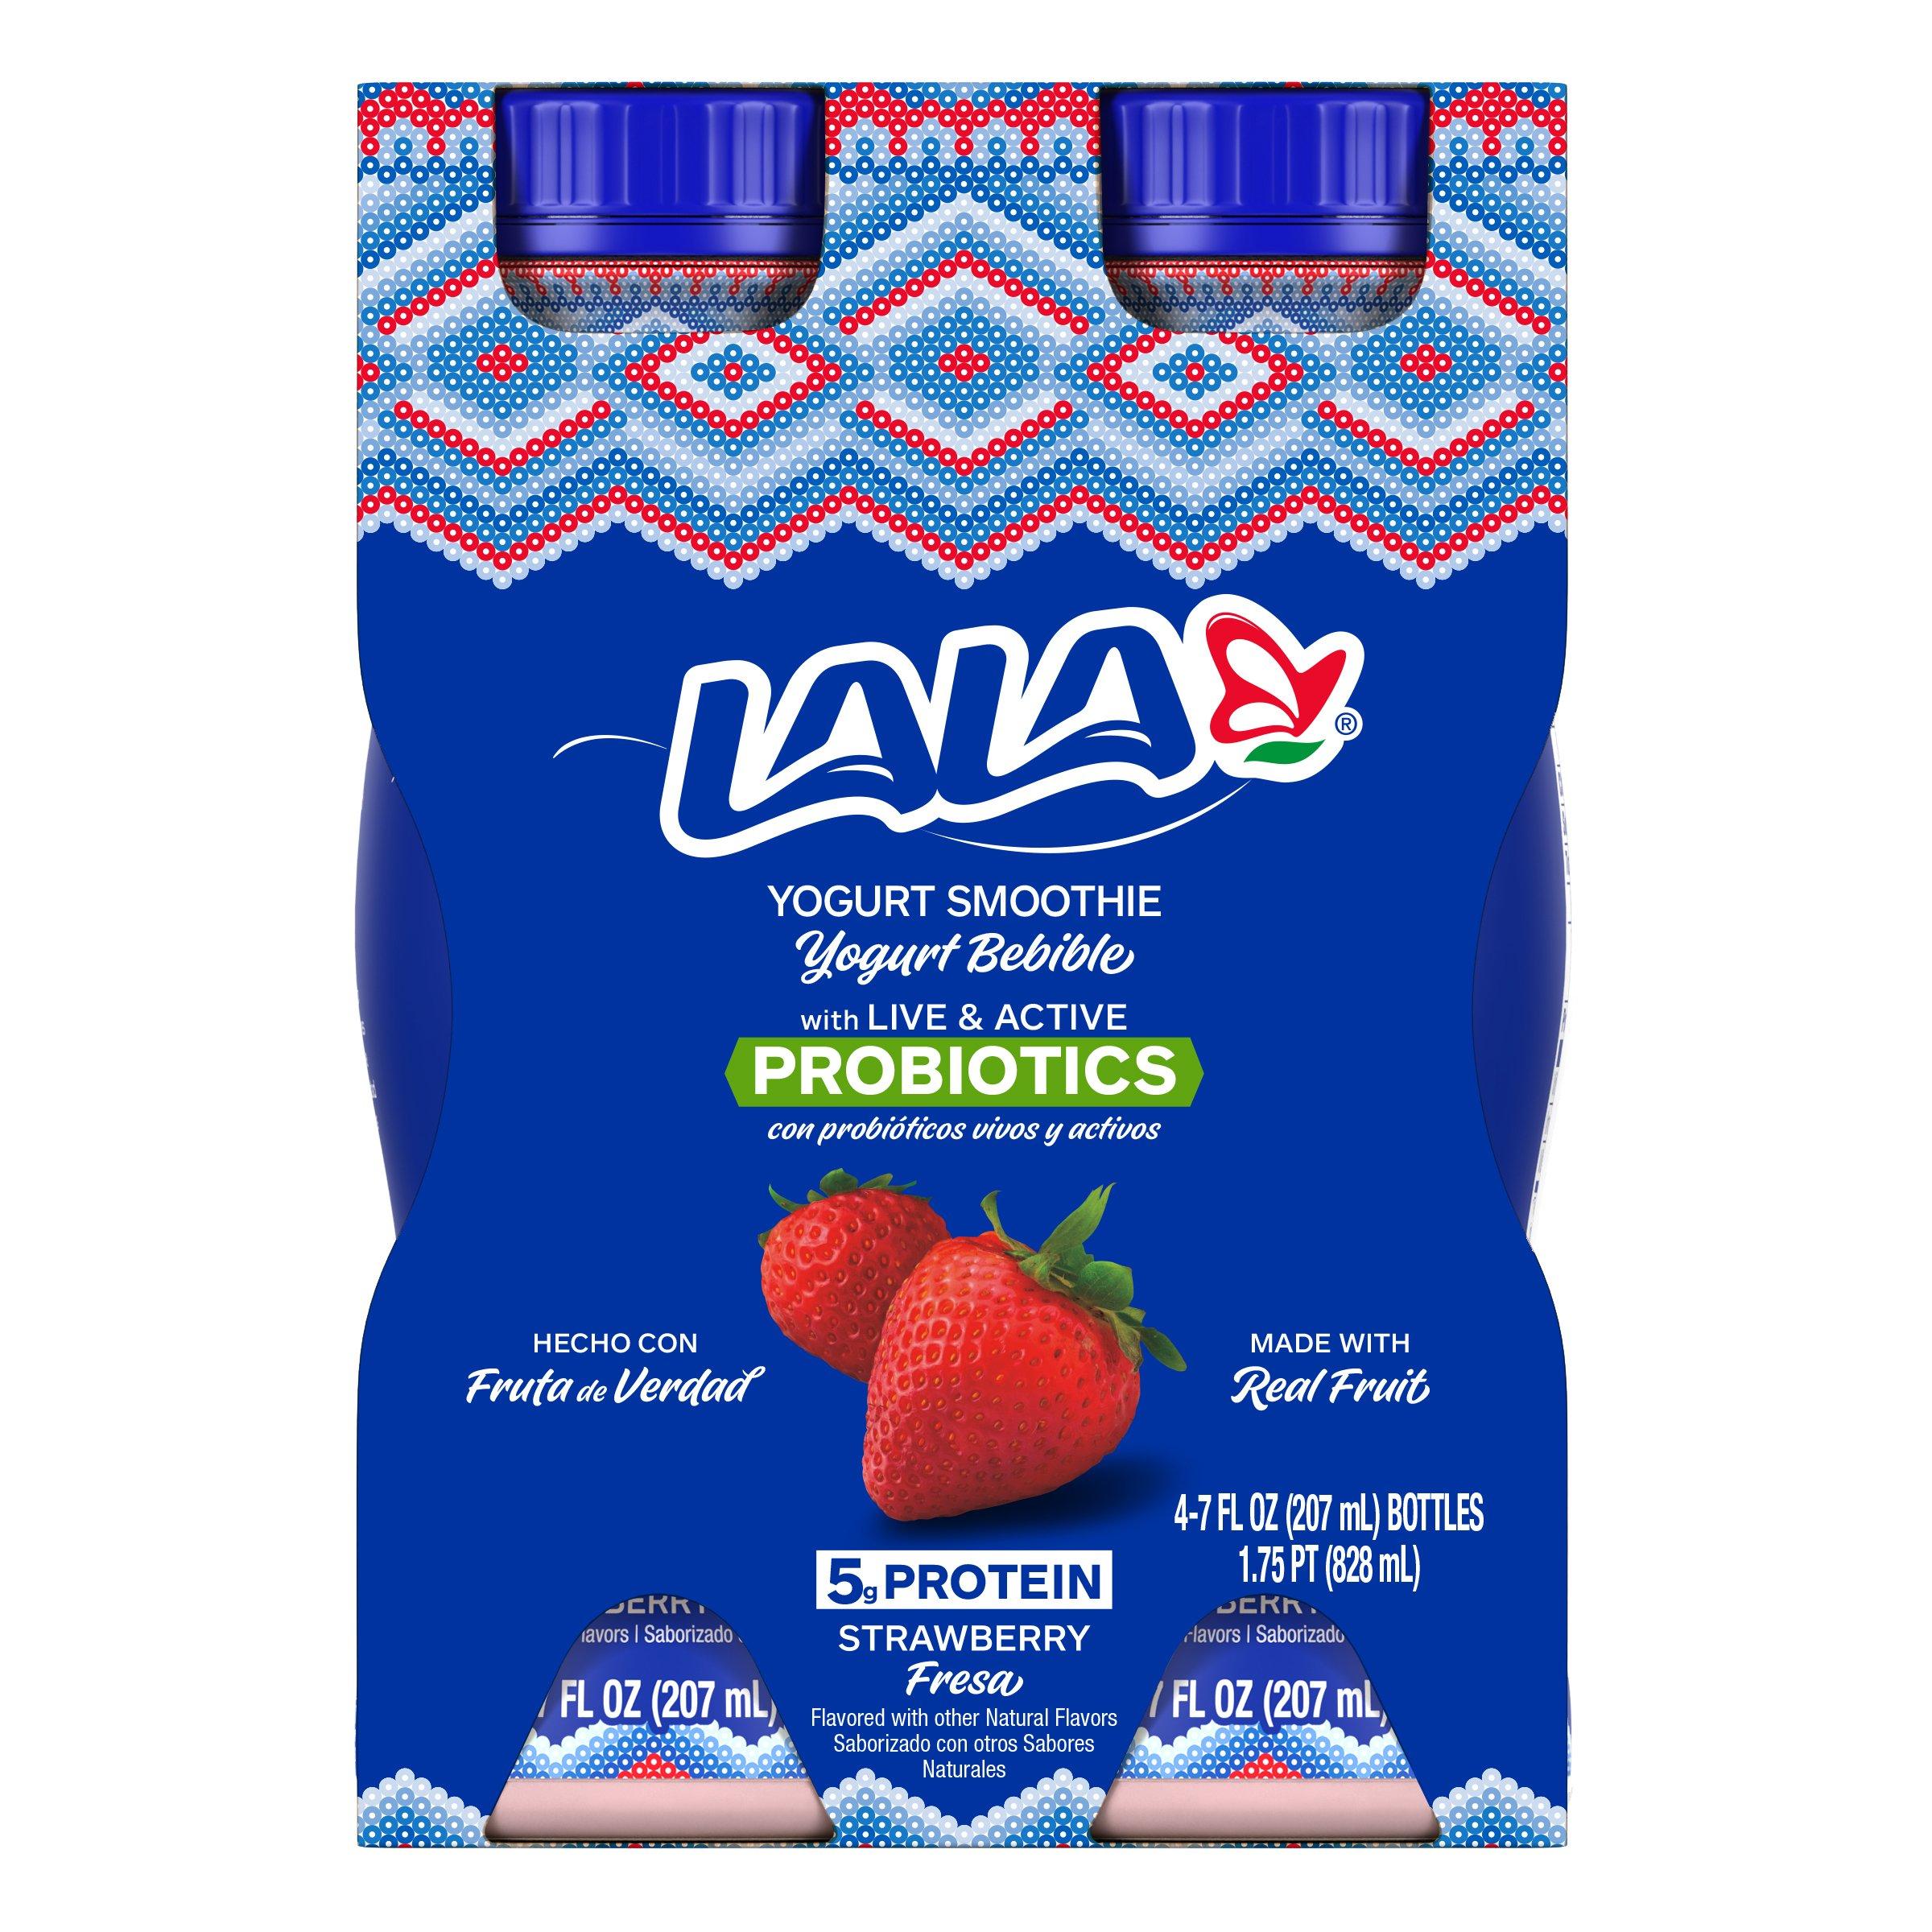 Lala Wild Strawberry Yogurt Smoothie - Shop Yogurt at HEB